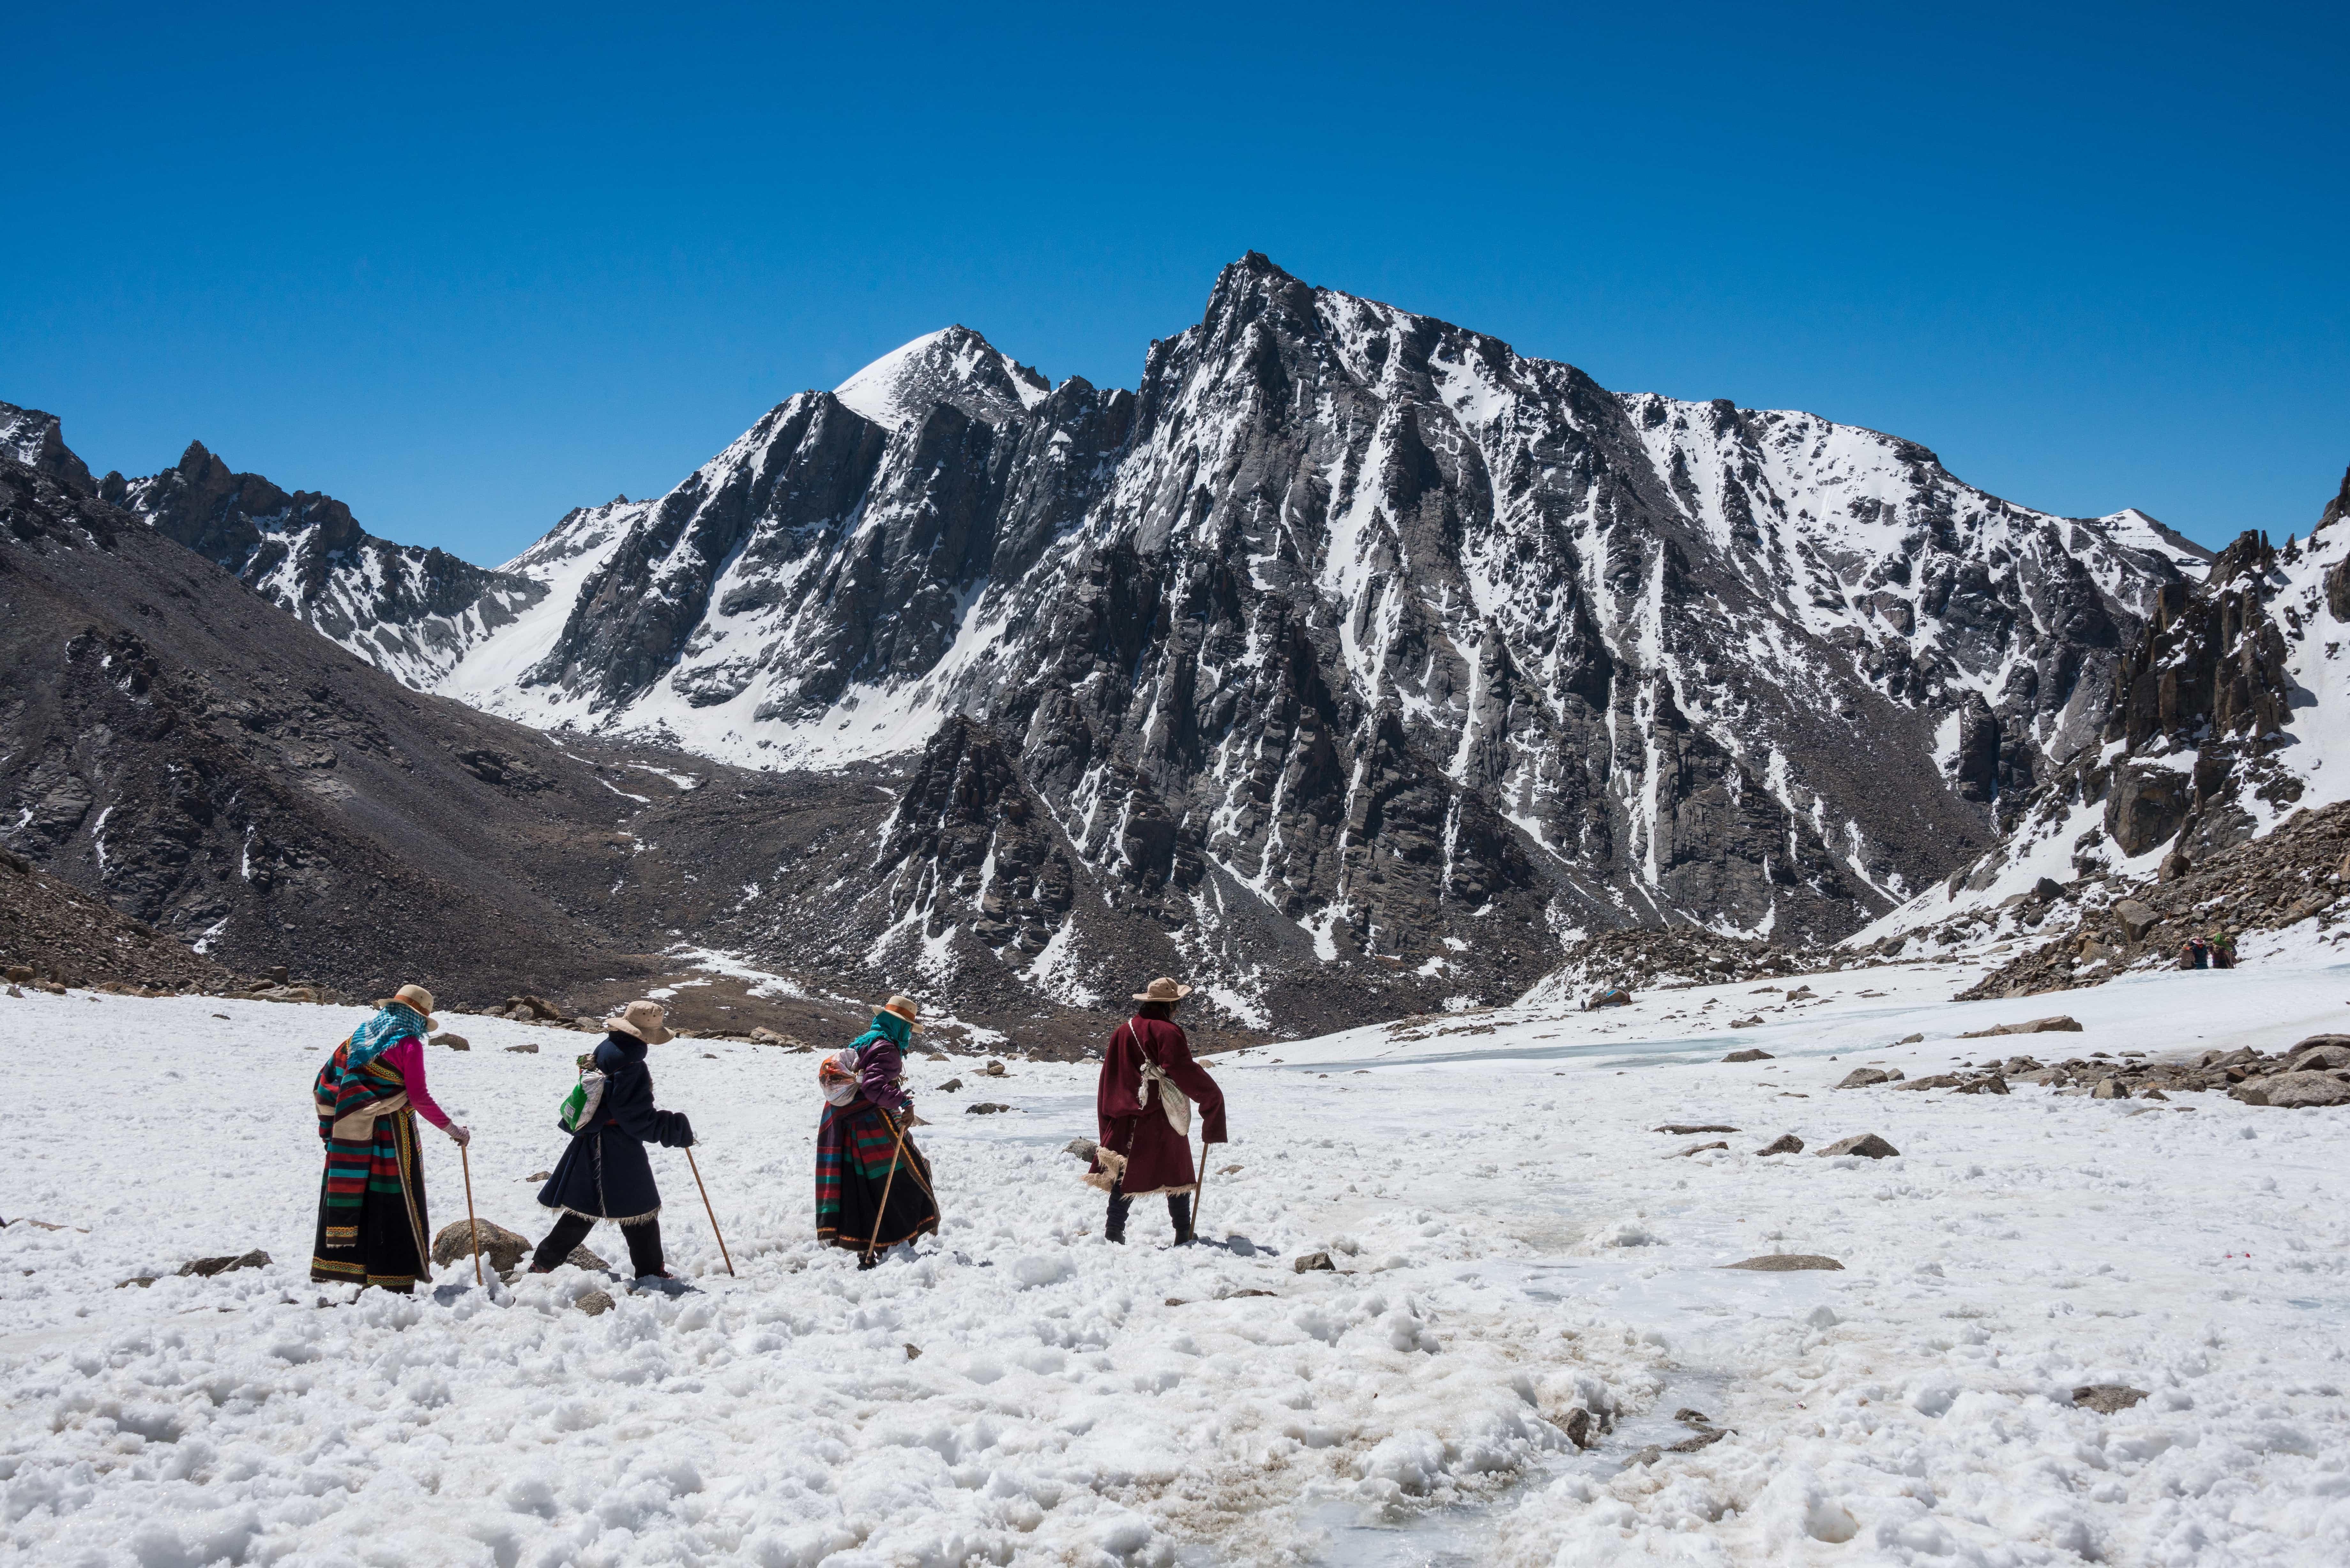 Tibetan Buddhist pilgrims walking the kora around Mount Kailash